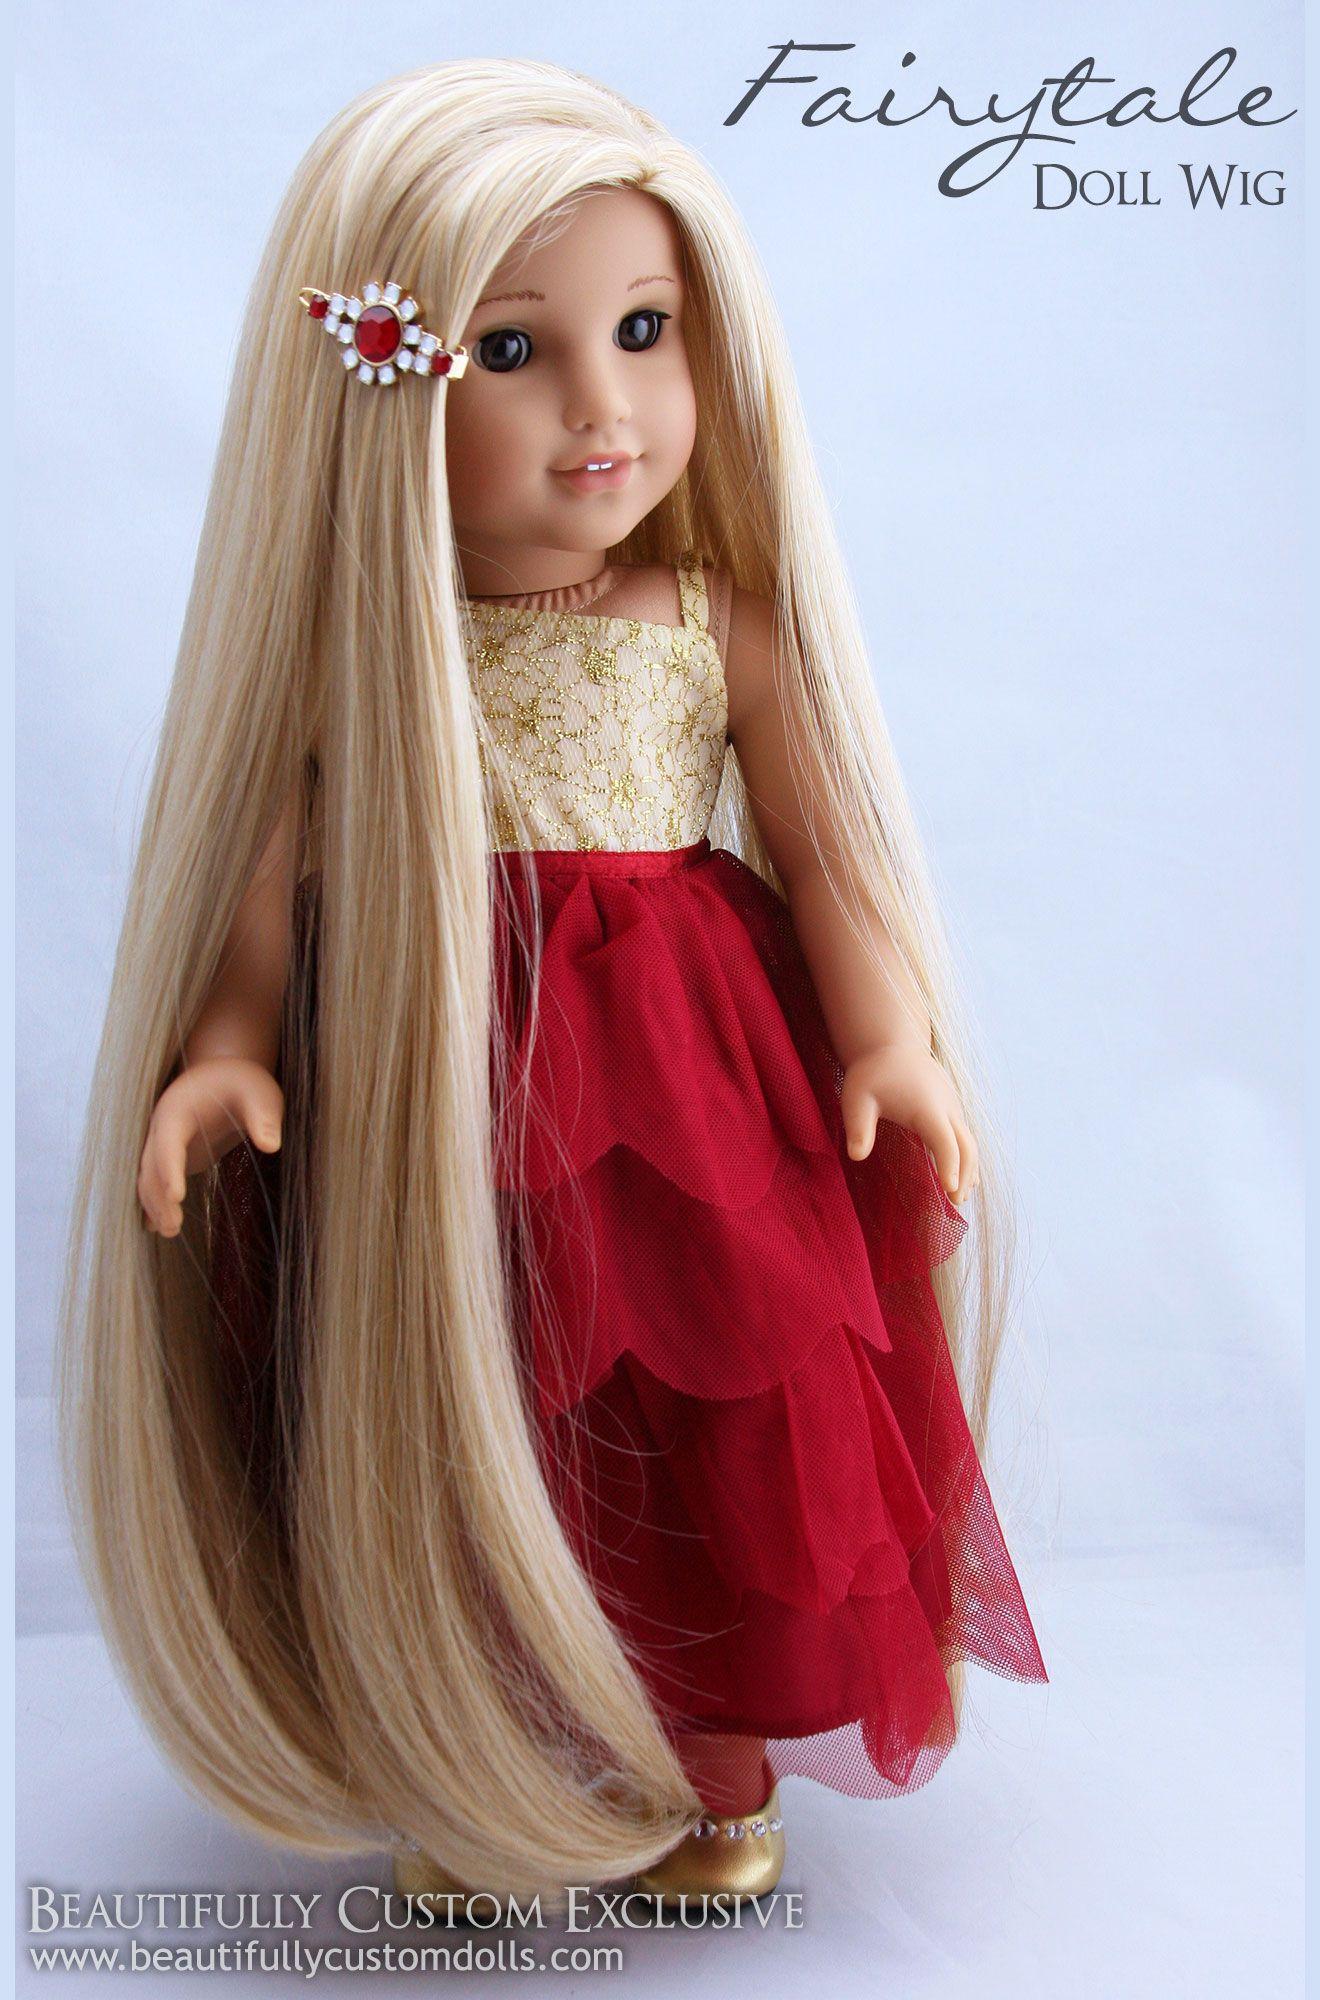 Fairytale Doll Wig for Custom American Girl Dolls in Sunrise Blonde